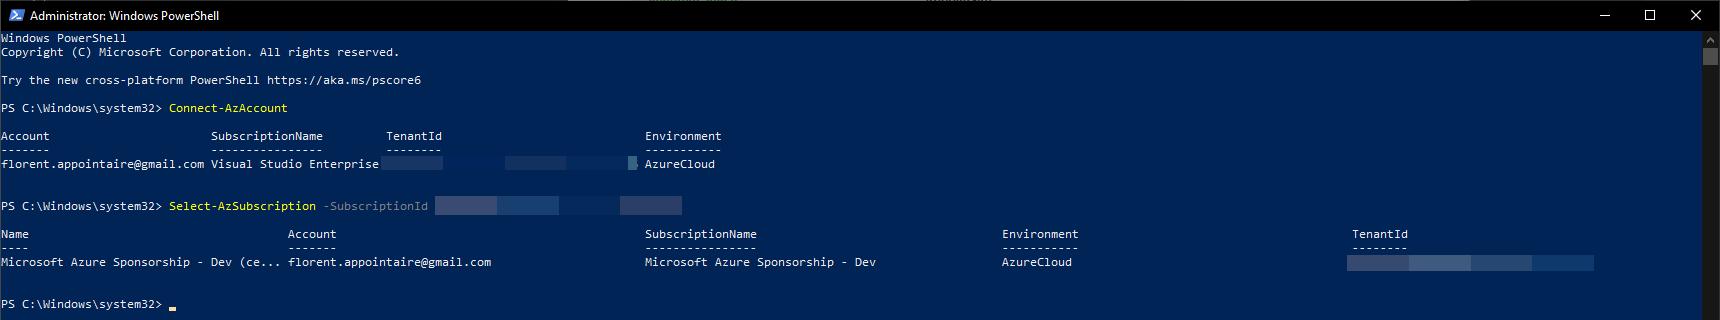 Azure account in PowerShell